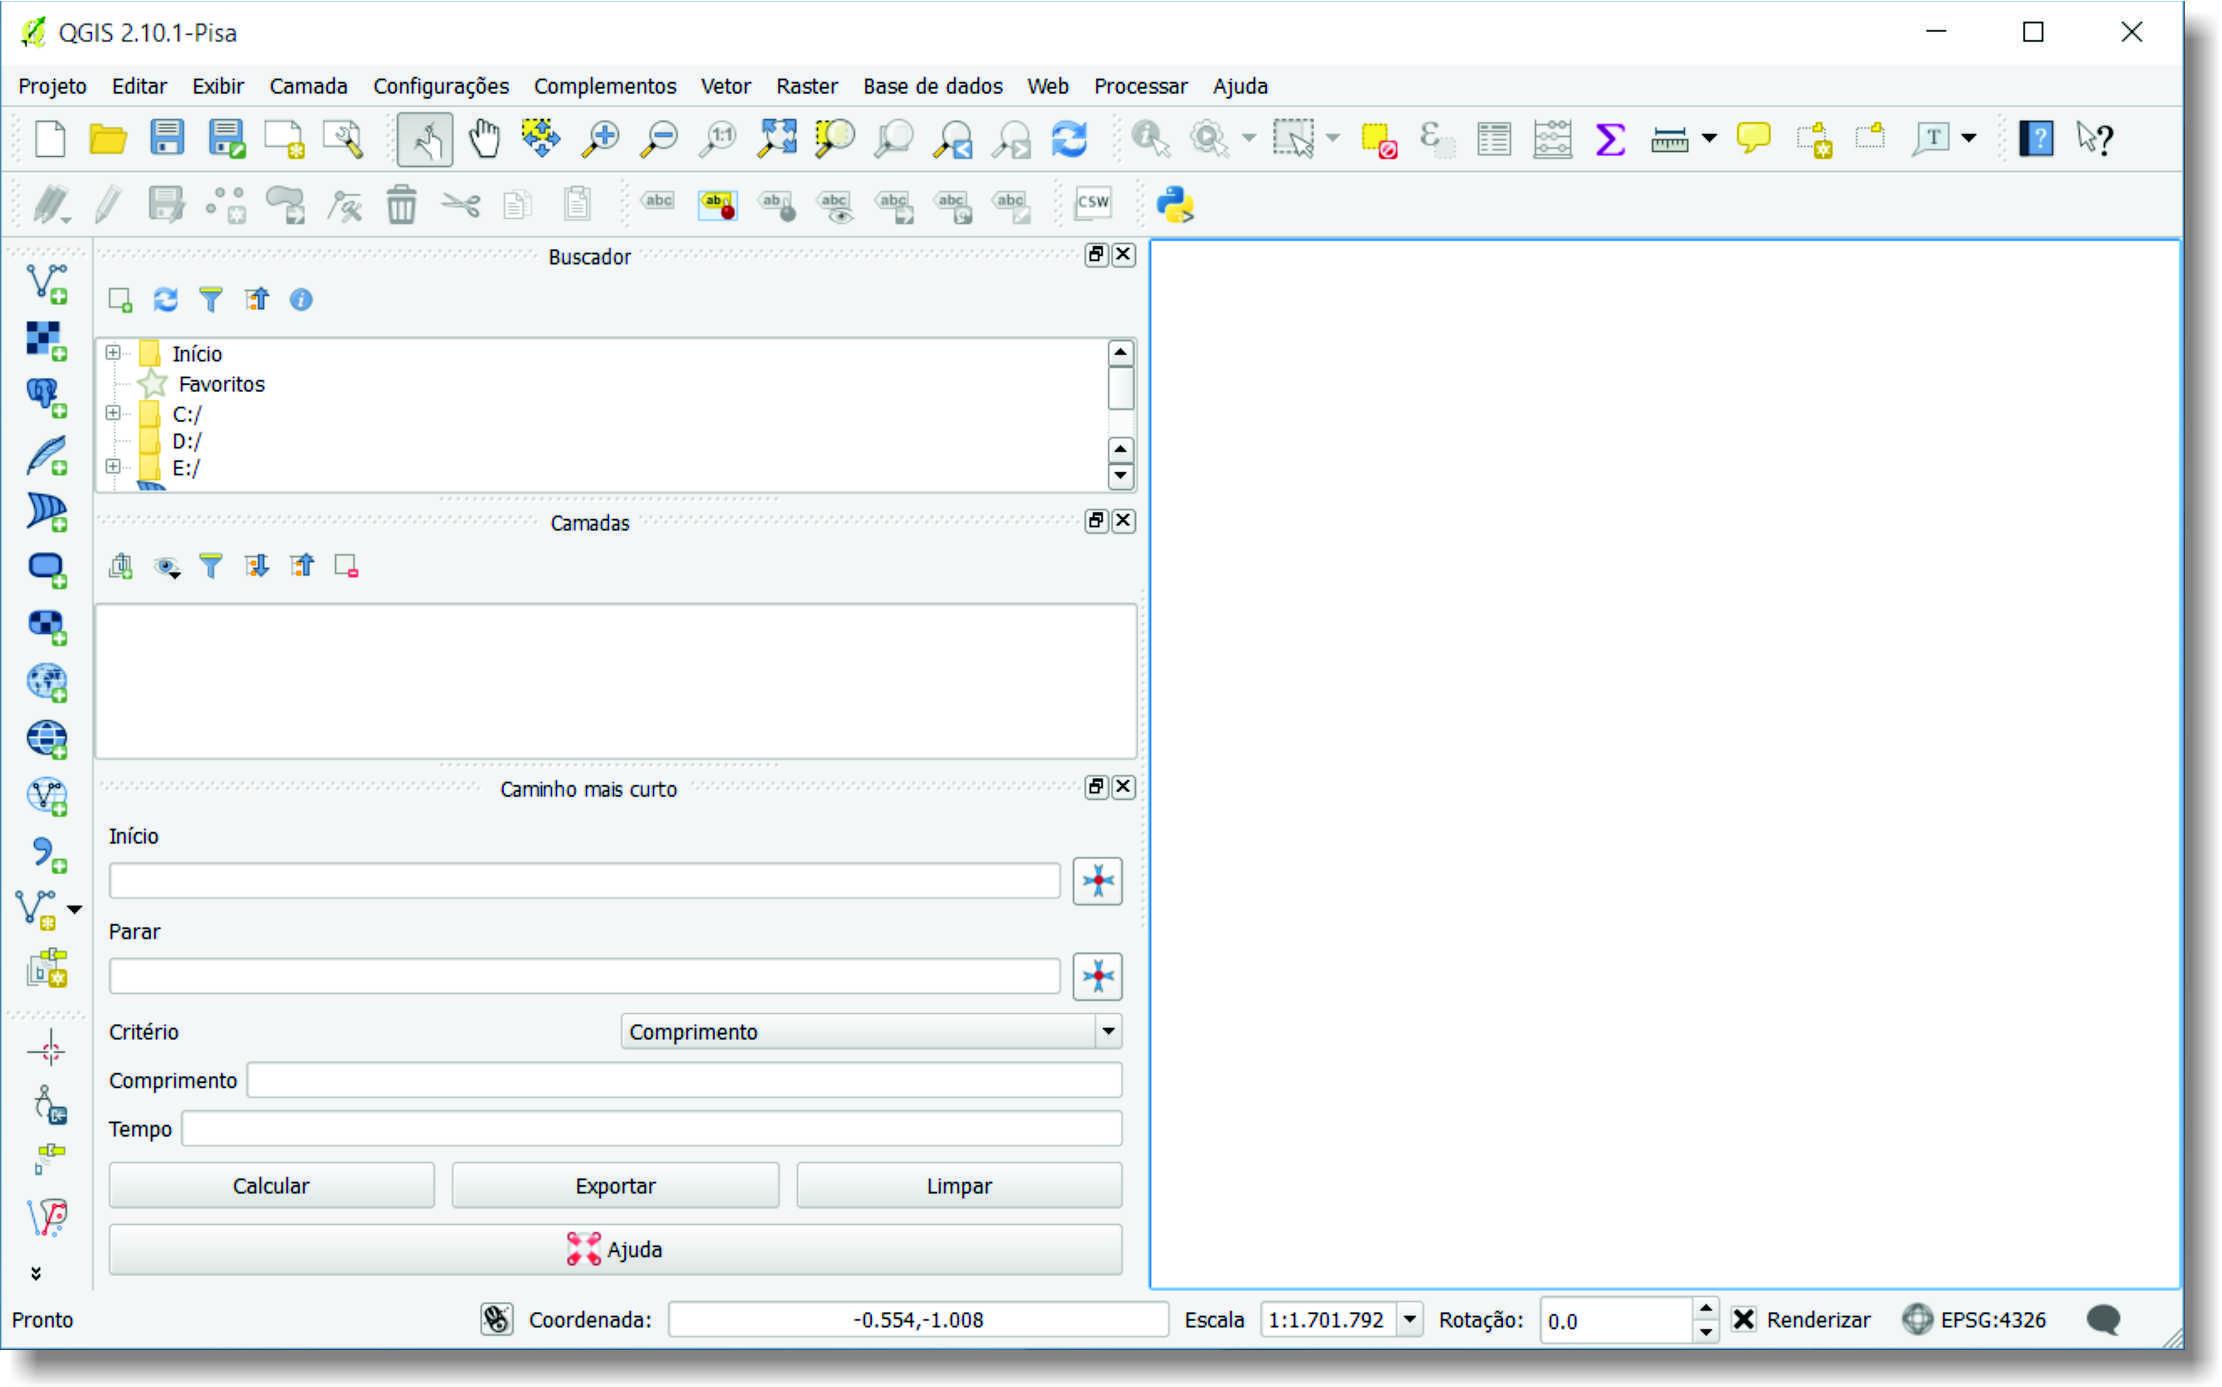 Interface inicial Decifrando o georreferenciamento de carta topográfica no QGIS